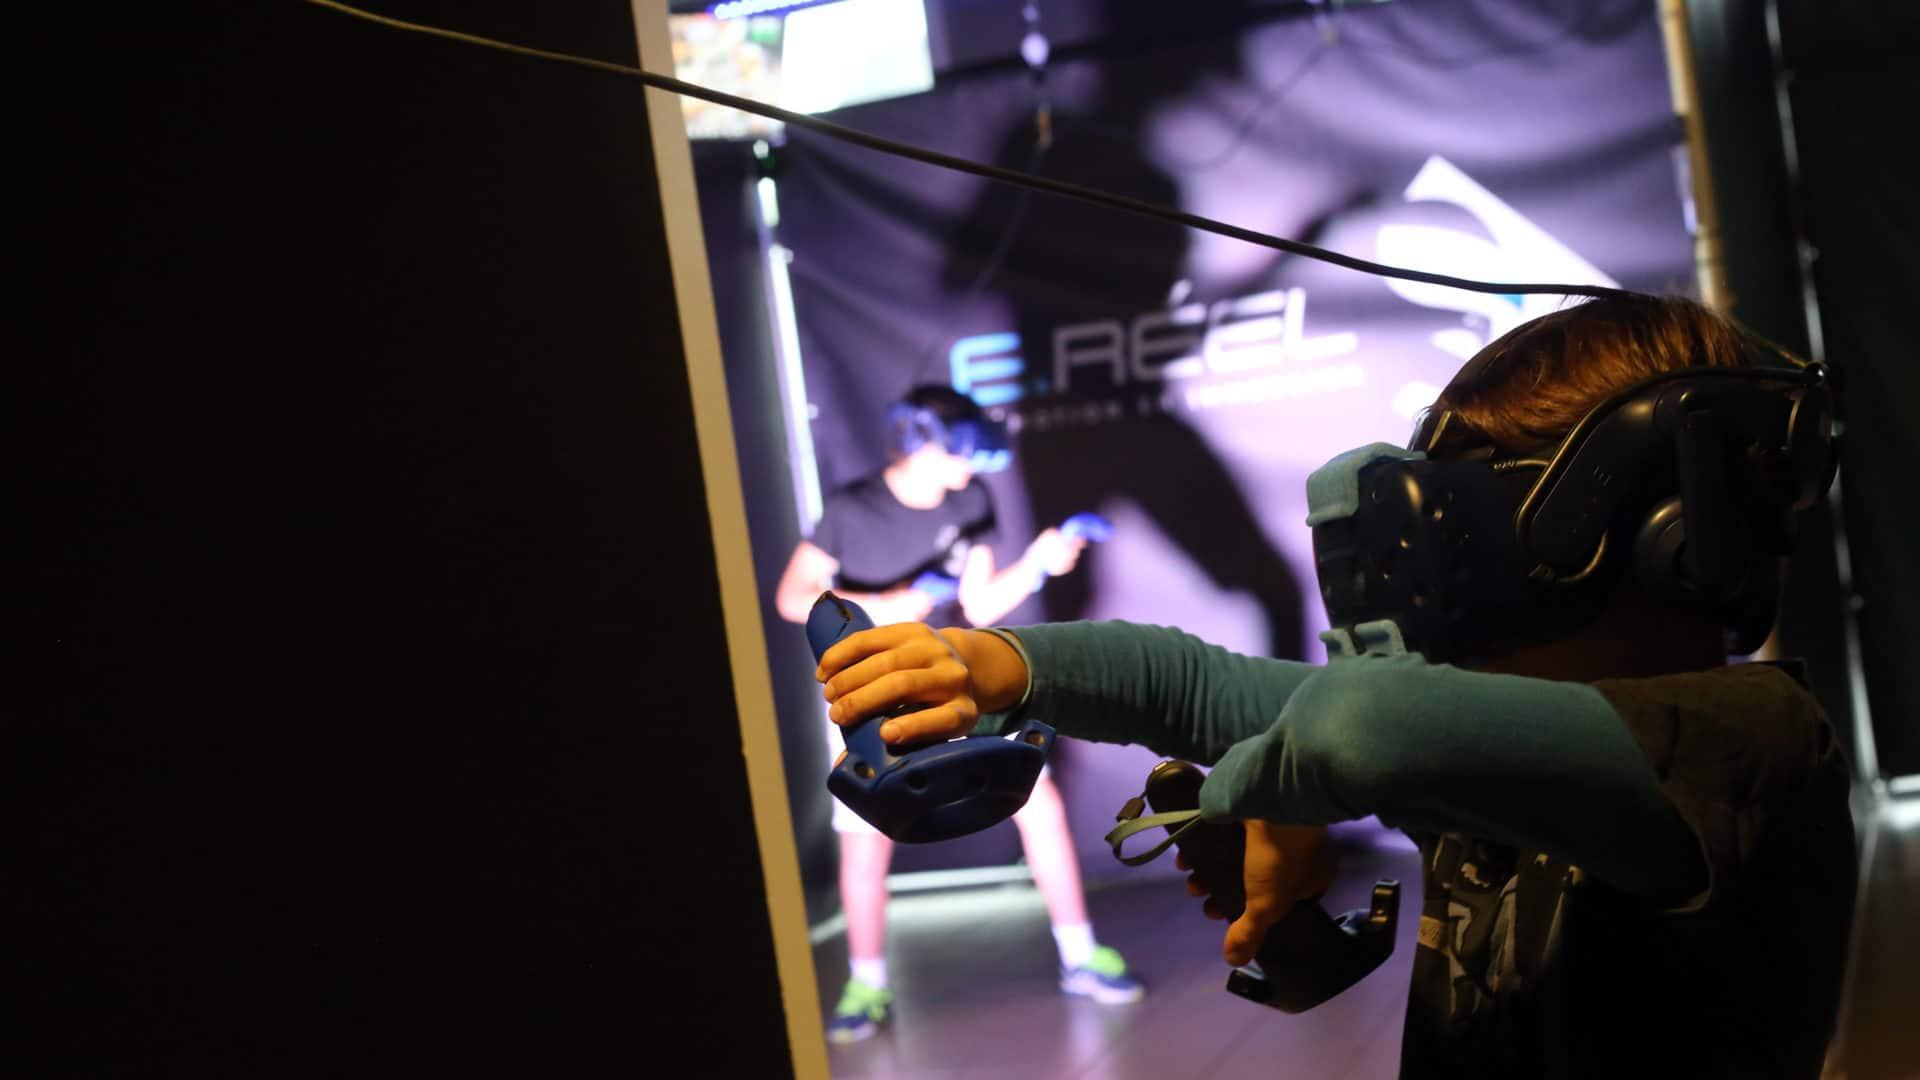 La VR, une alternative au laser game à Annecy